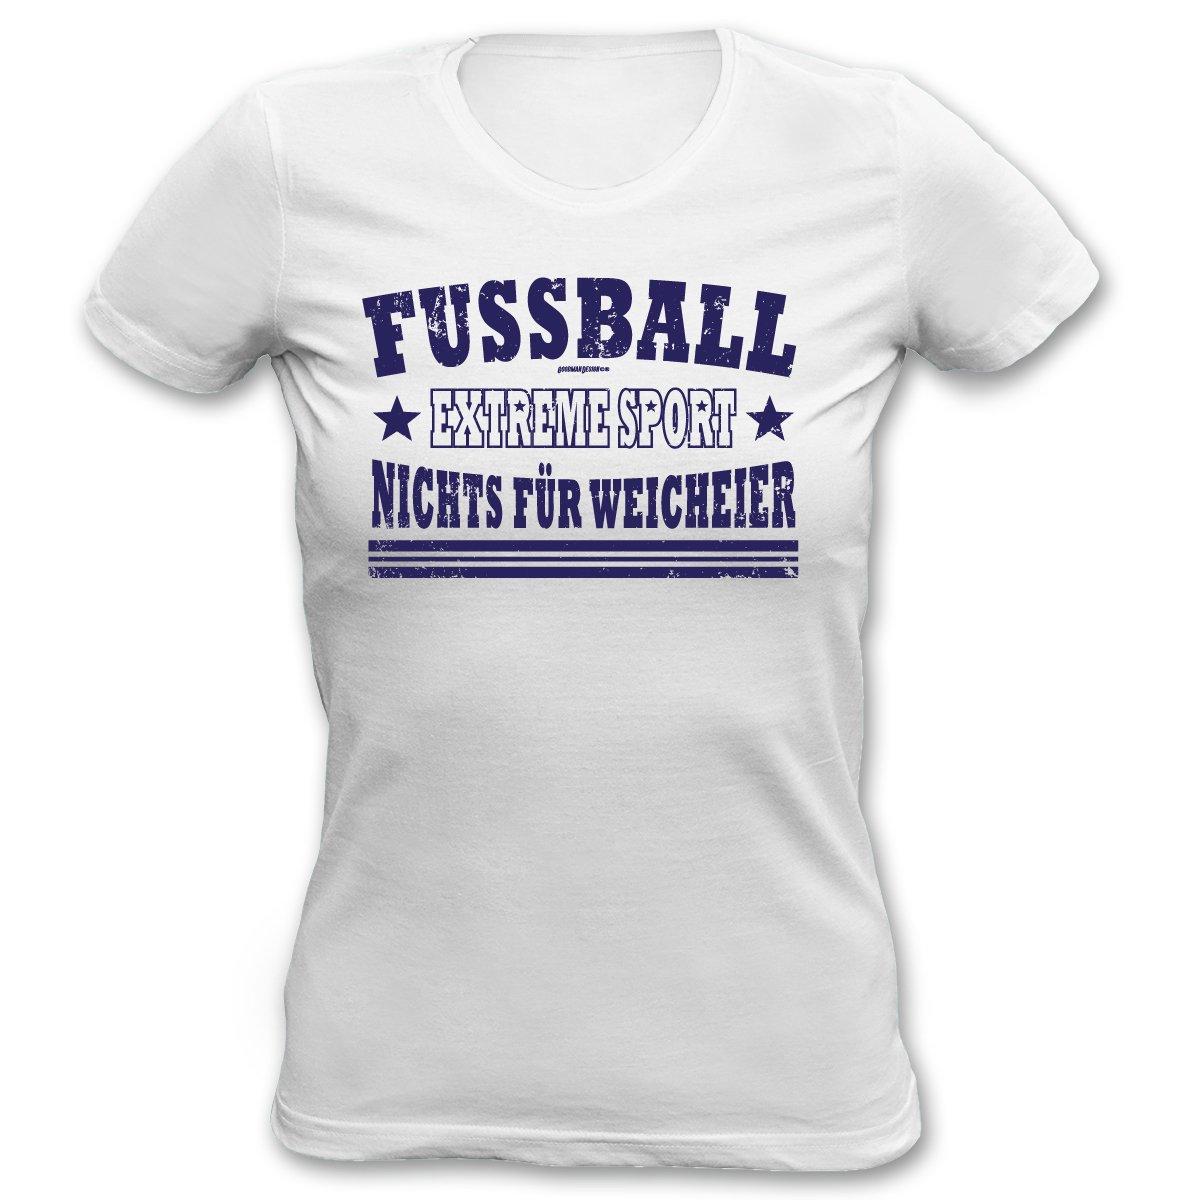 Cooles Fußball T-Shirt für Damen : Fussball / Fussball Extreme Sport - Goodman Design - Sportshirt Damen Farbe: weiss